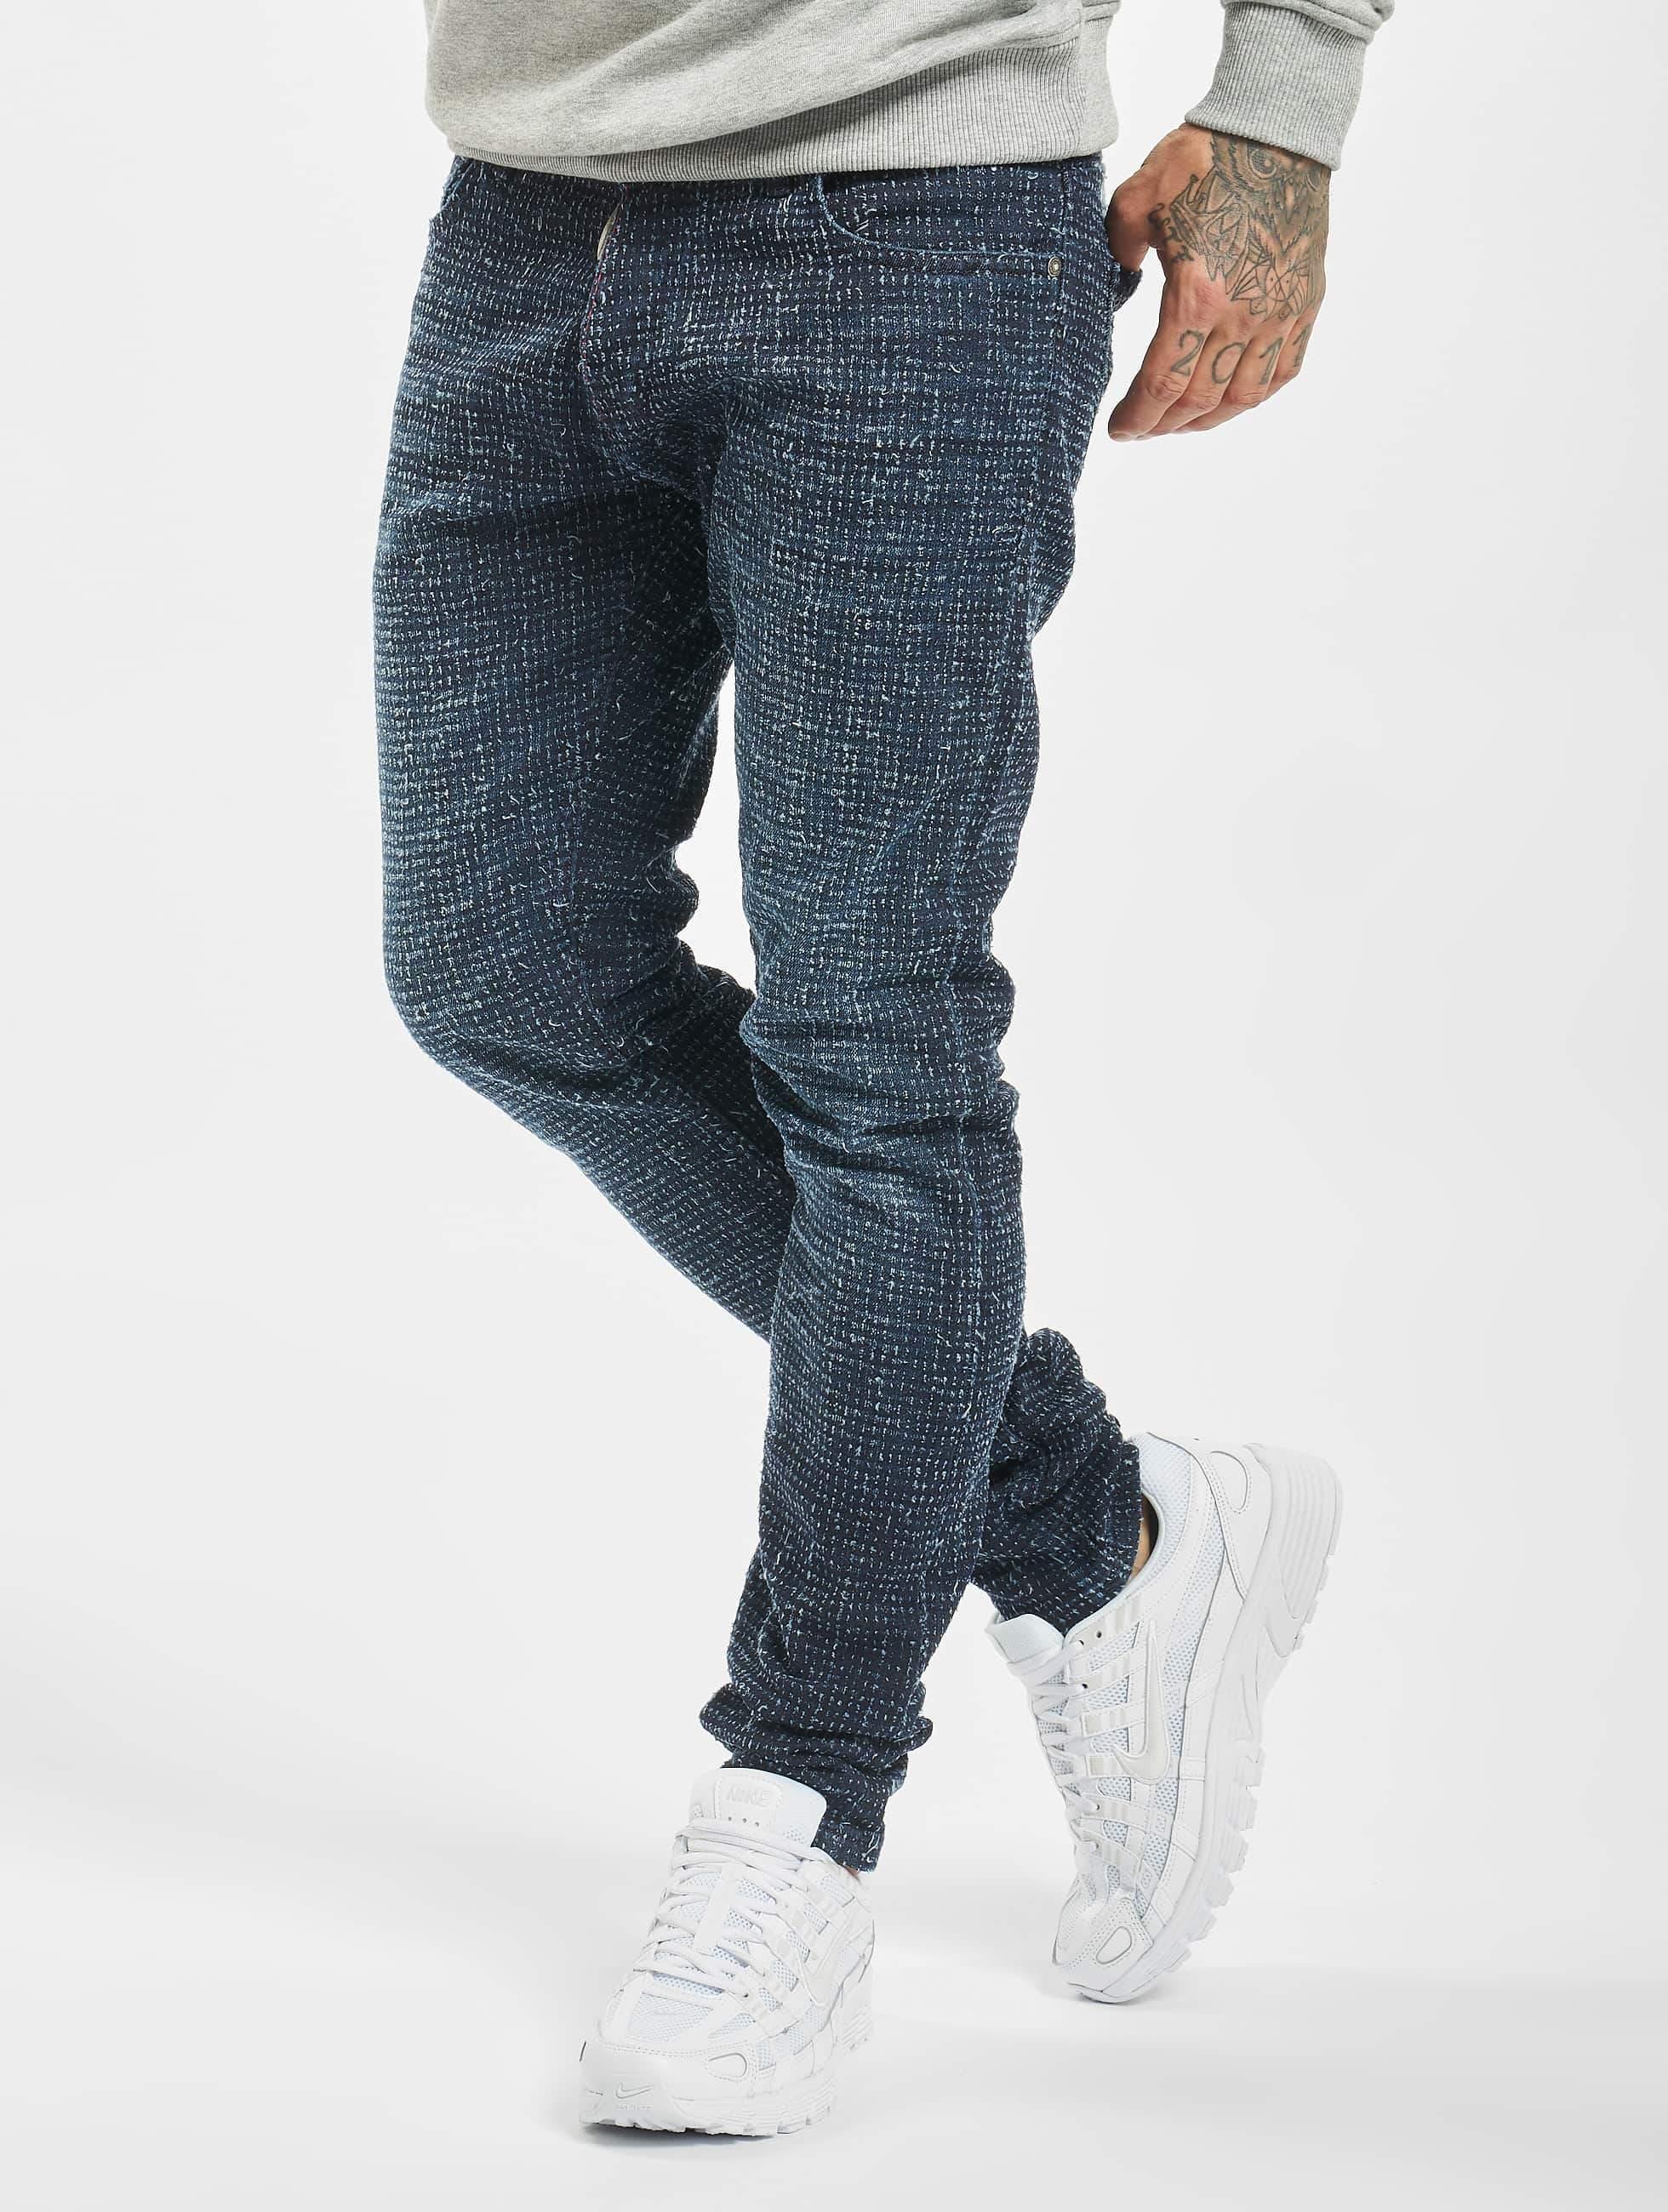 2Y / Skinny Jeans Bradford in blue W 32